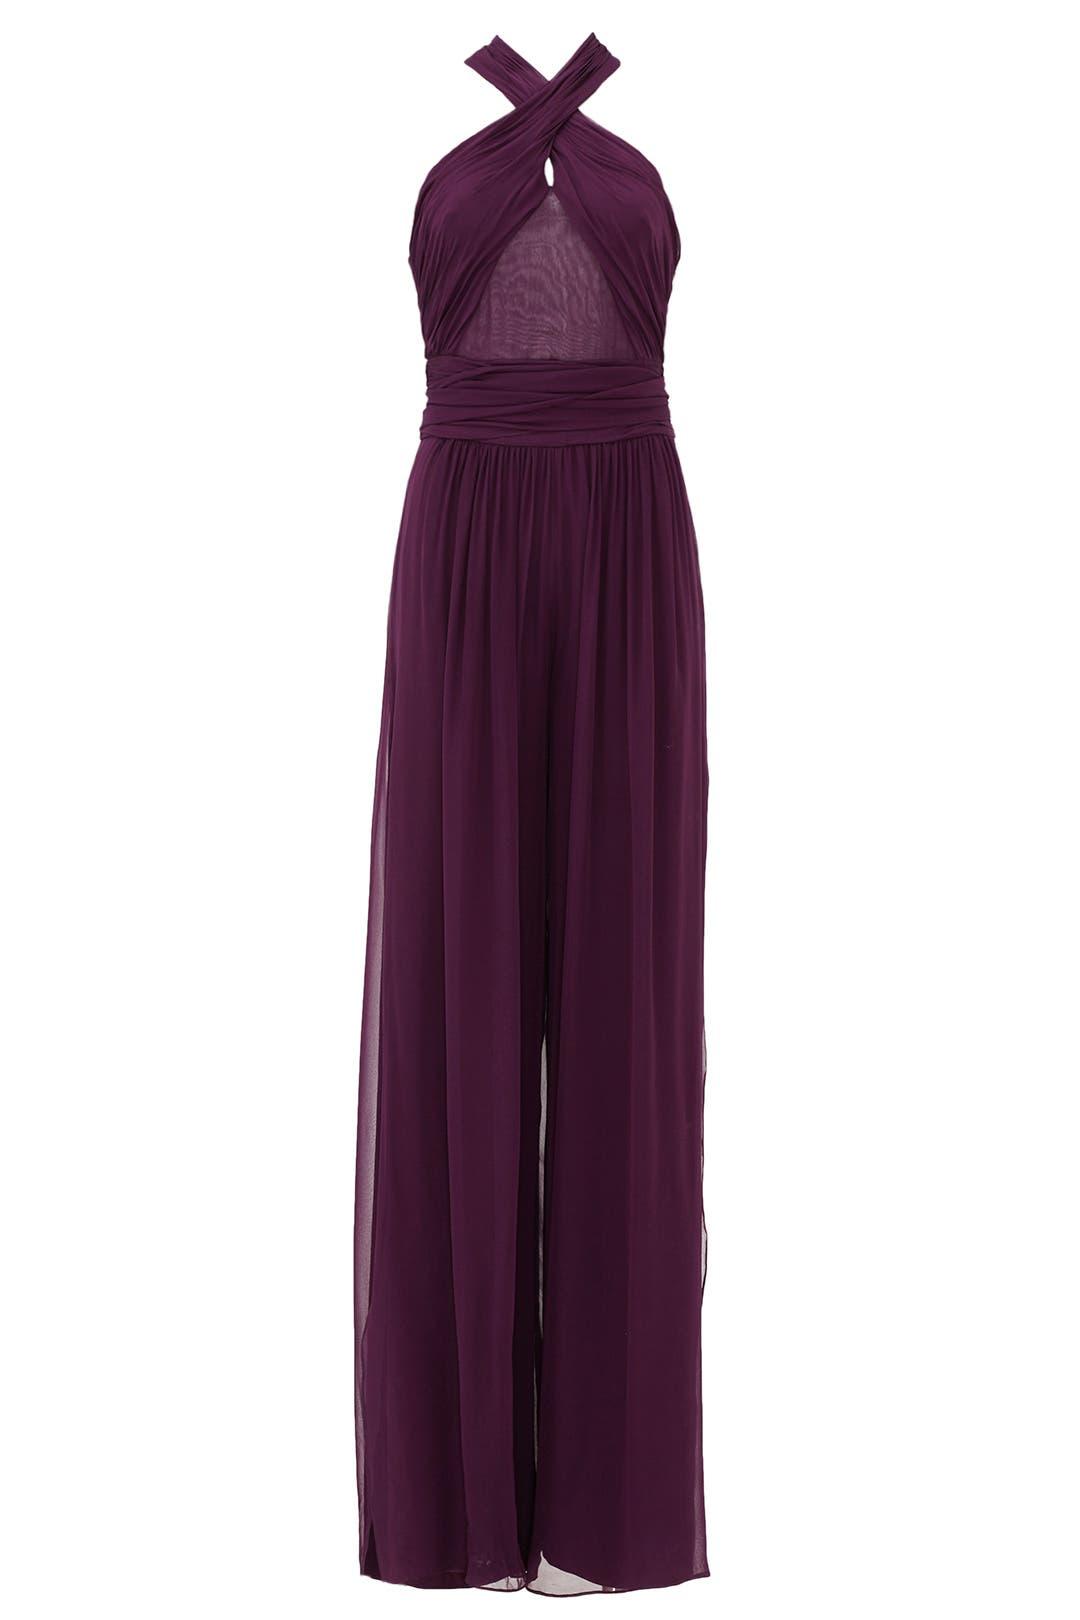 efddddcccc3 Rachel Zoe. Read Reviews. Purple Robbins Jumpsuit